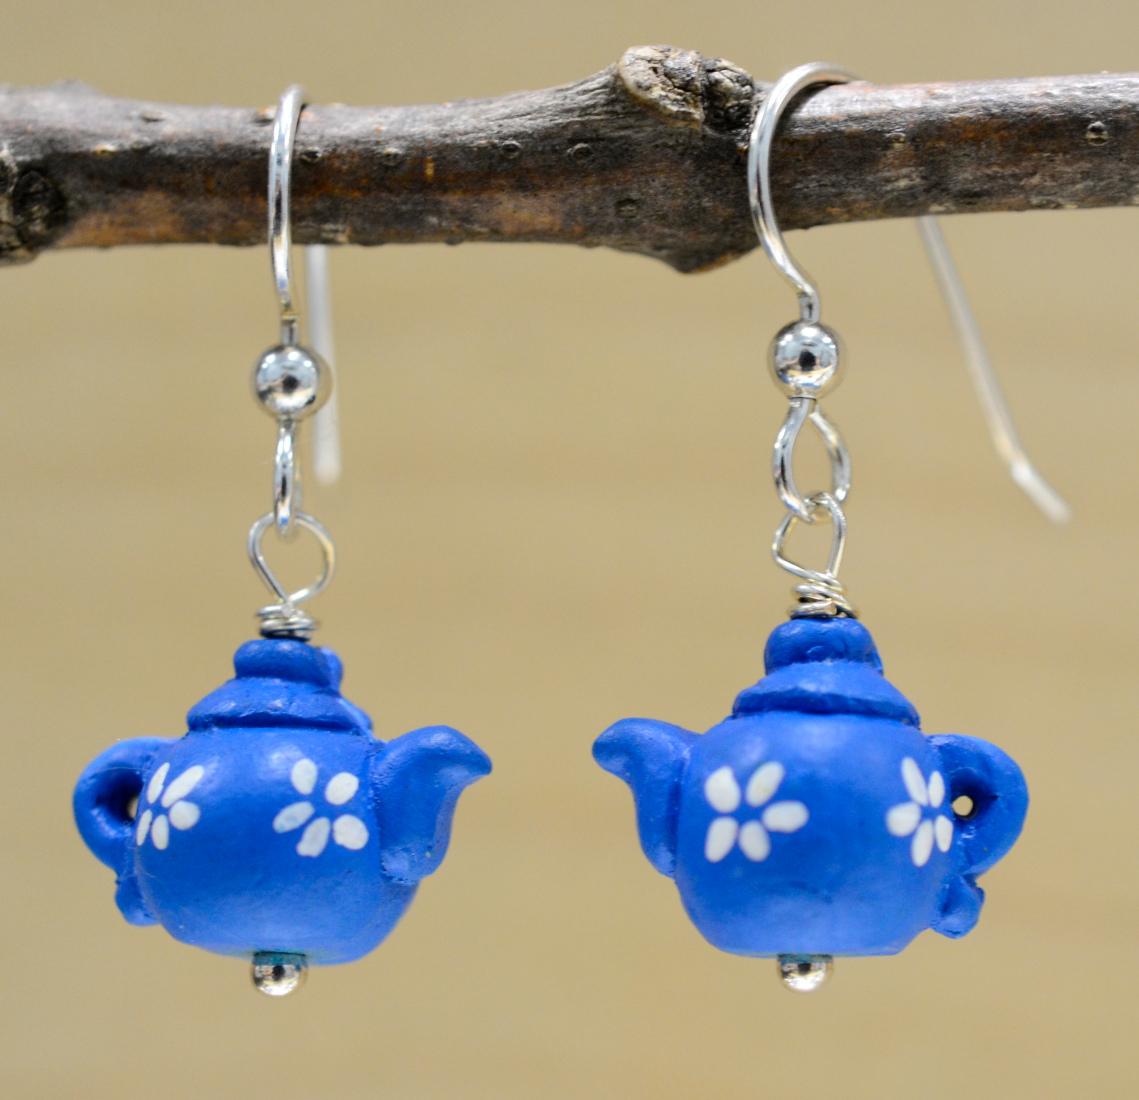 Blue ceramic teapot earrings